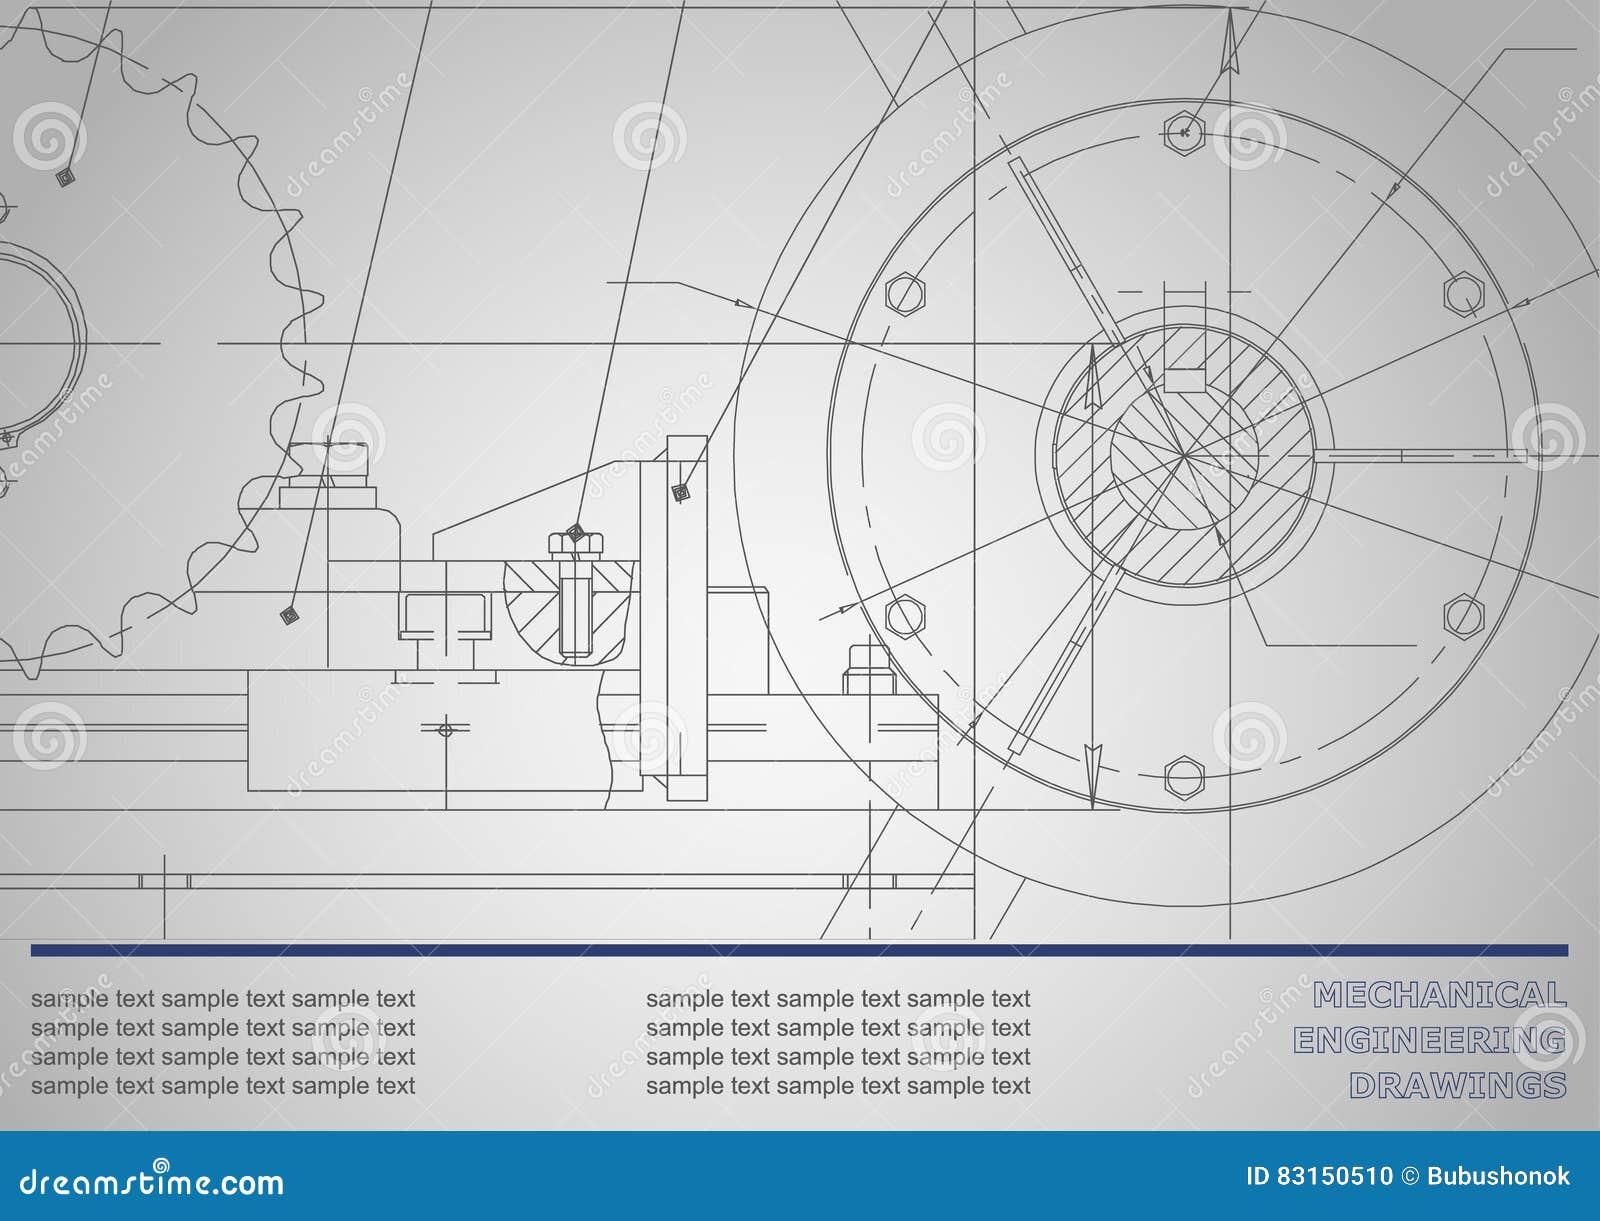 Manuale meccanica hoepli pdf